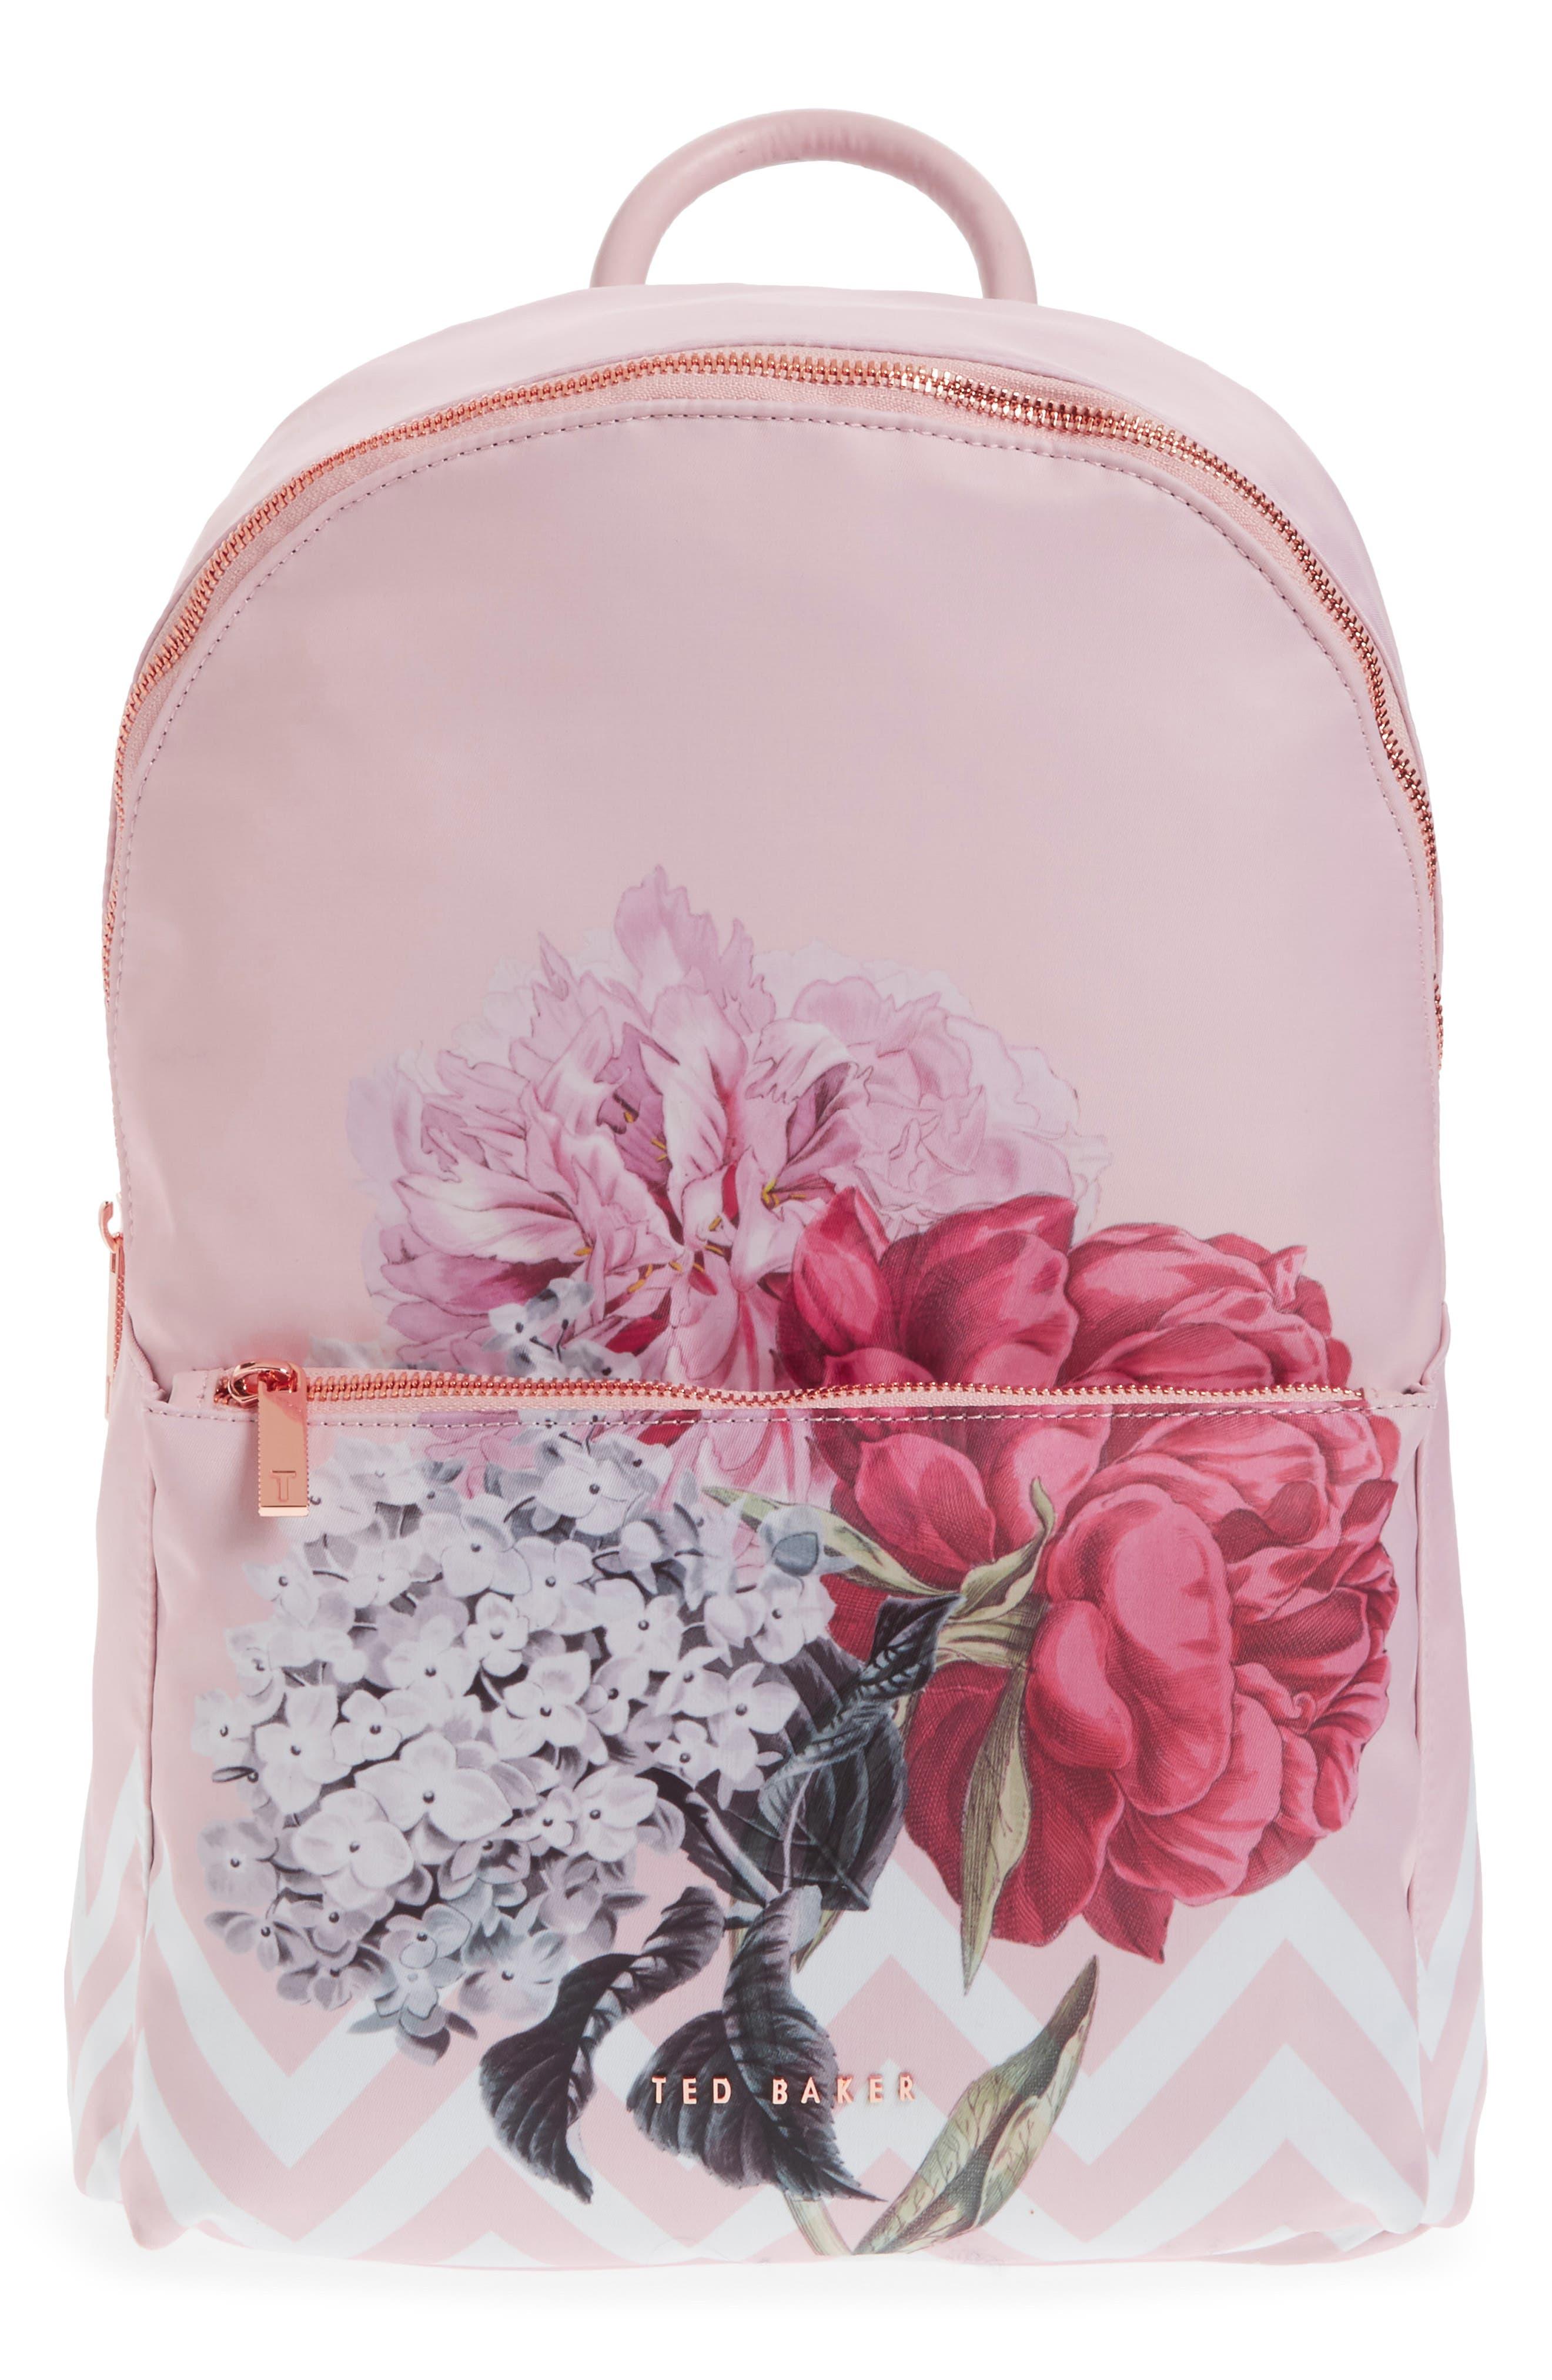 Ted Baker London Palace Gardens Nylon Backpack